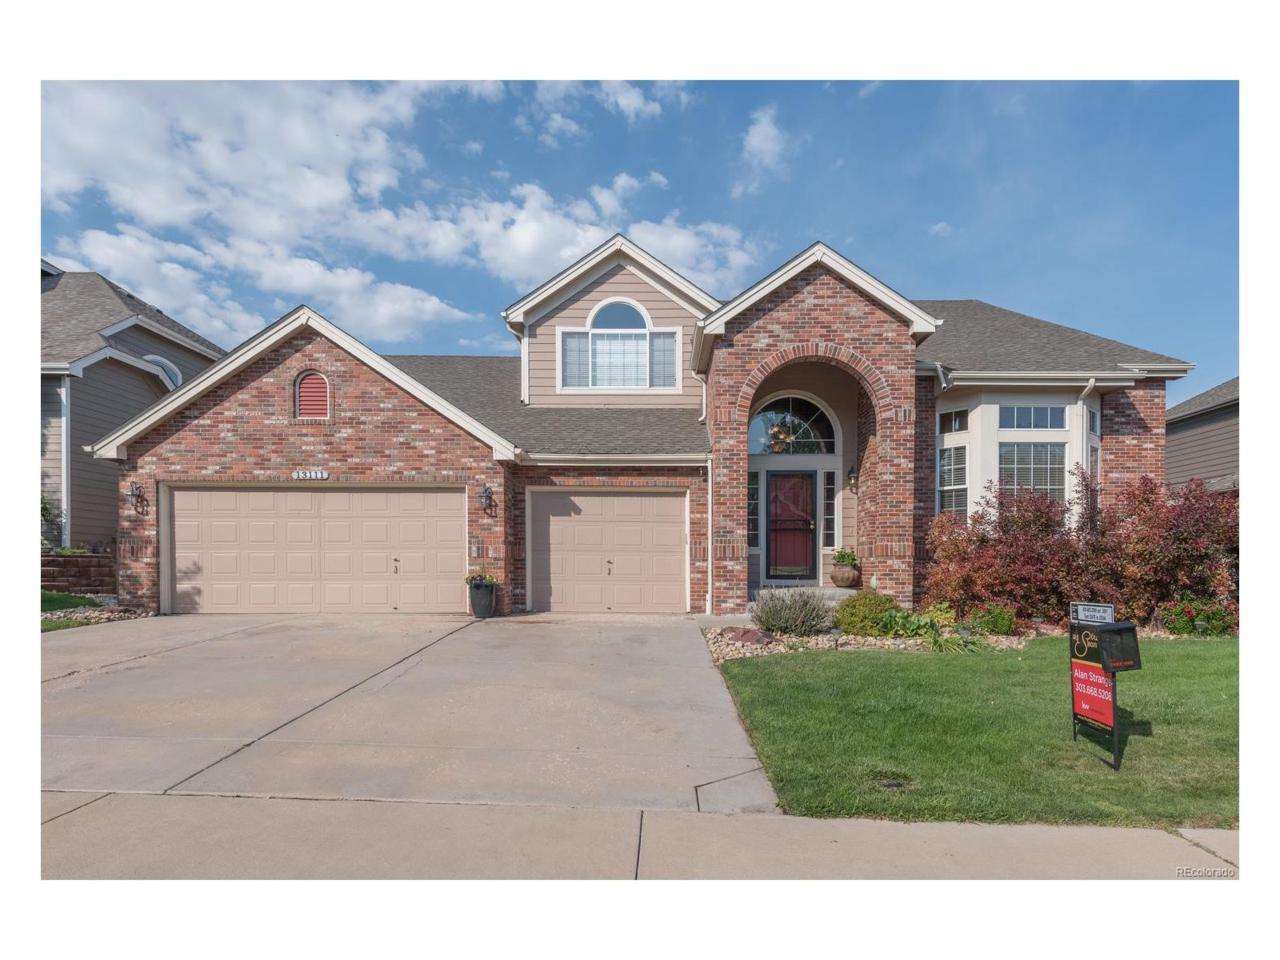 13111 Logan Street, Thornton, CO 80241 (MLS #6999010) :: 8z Real Estate